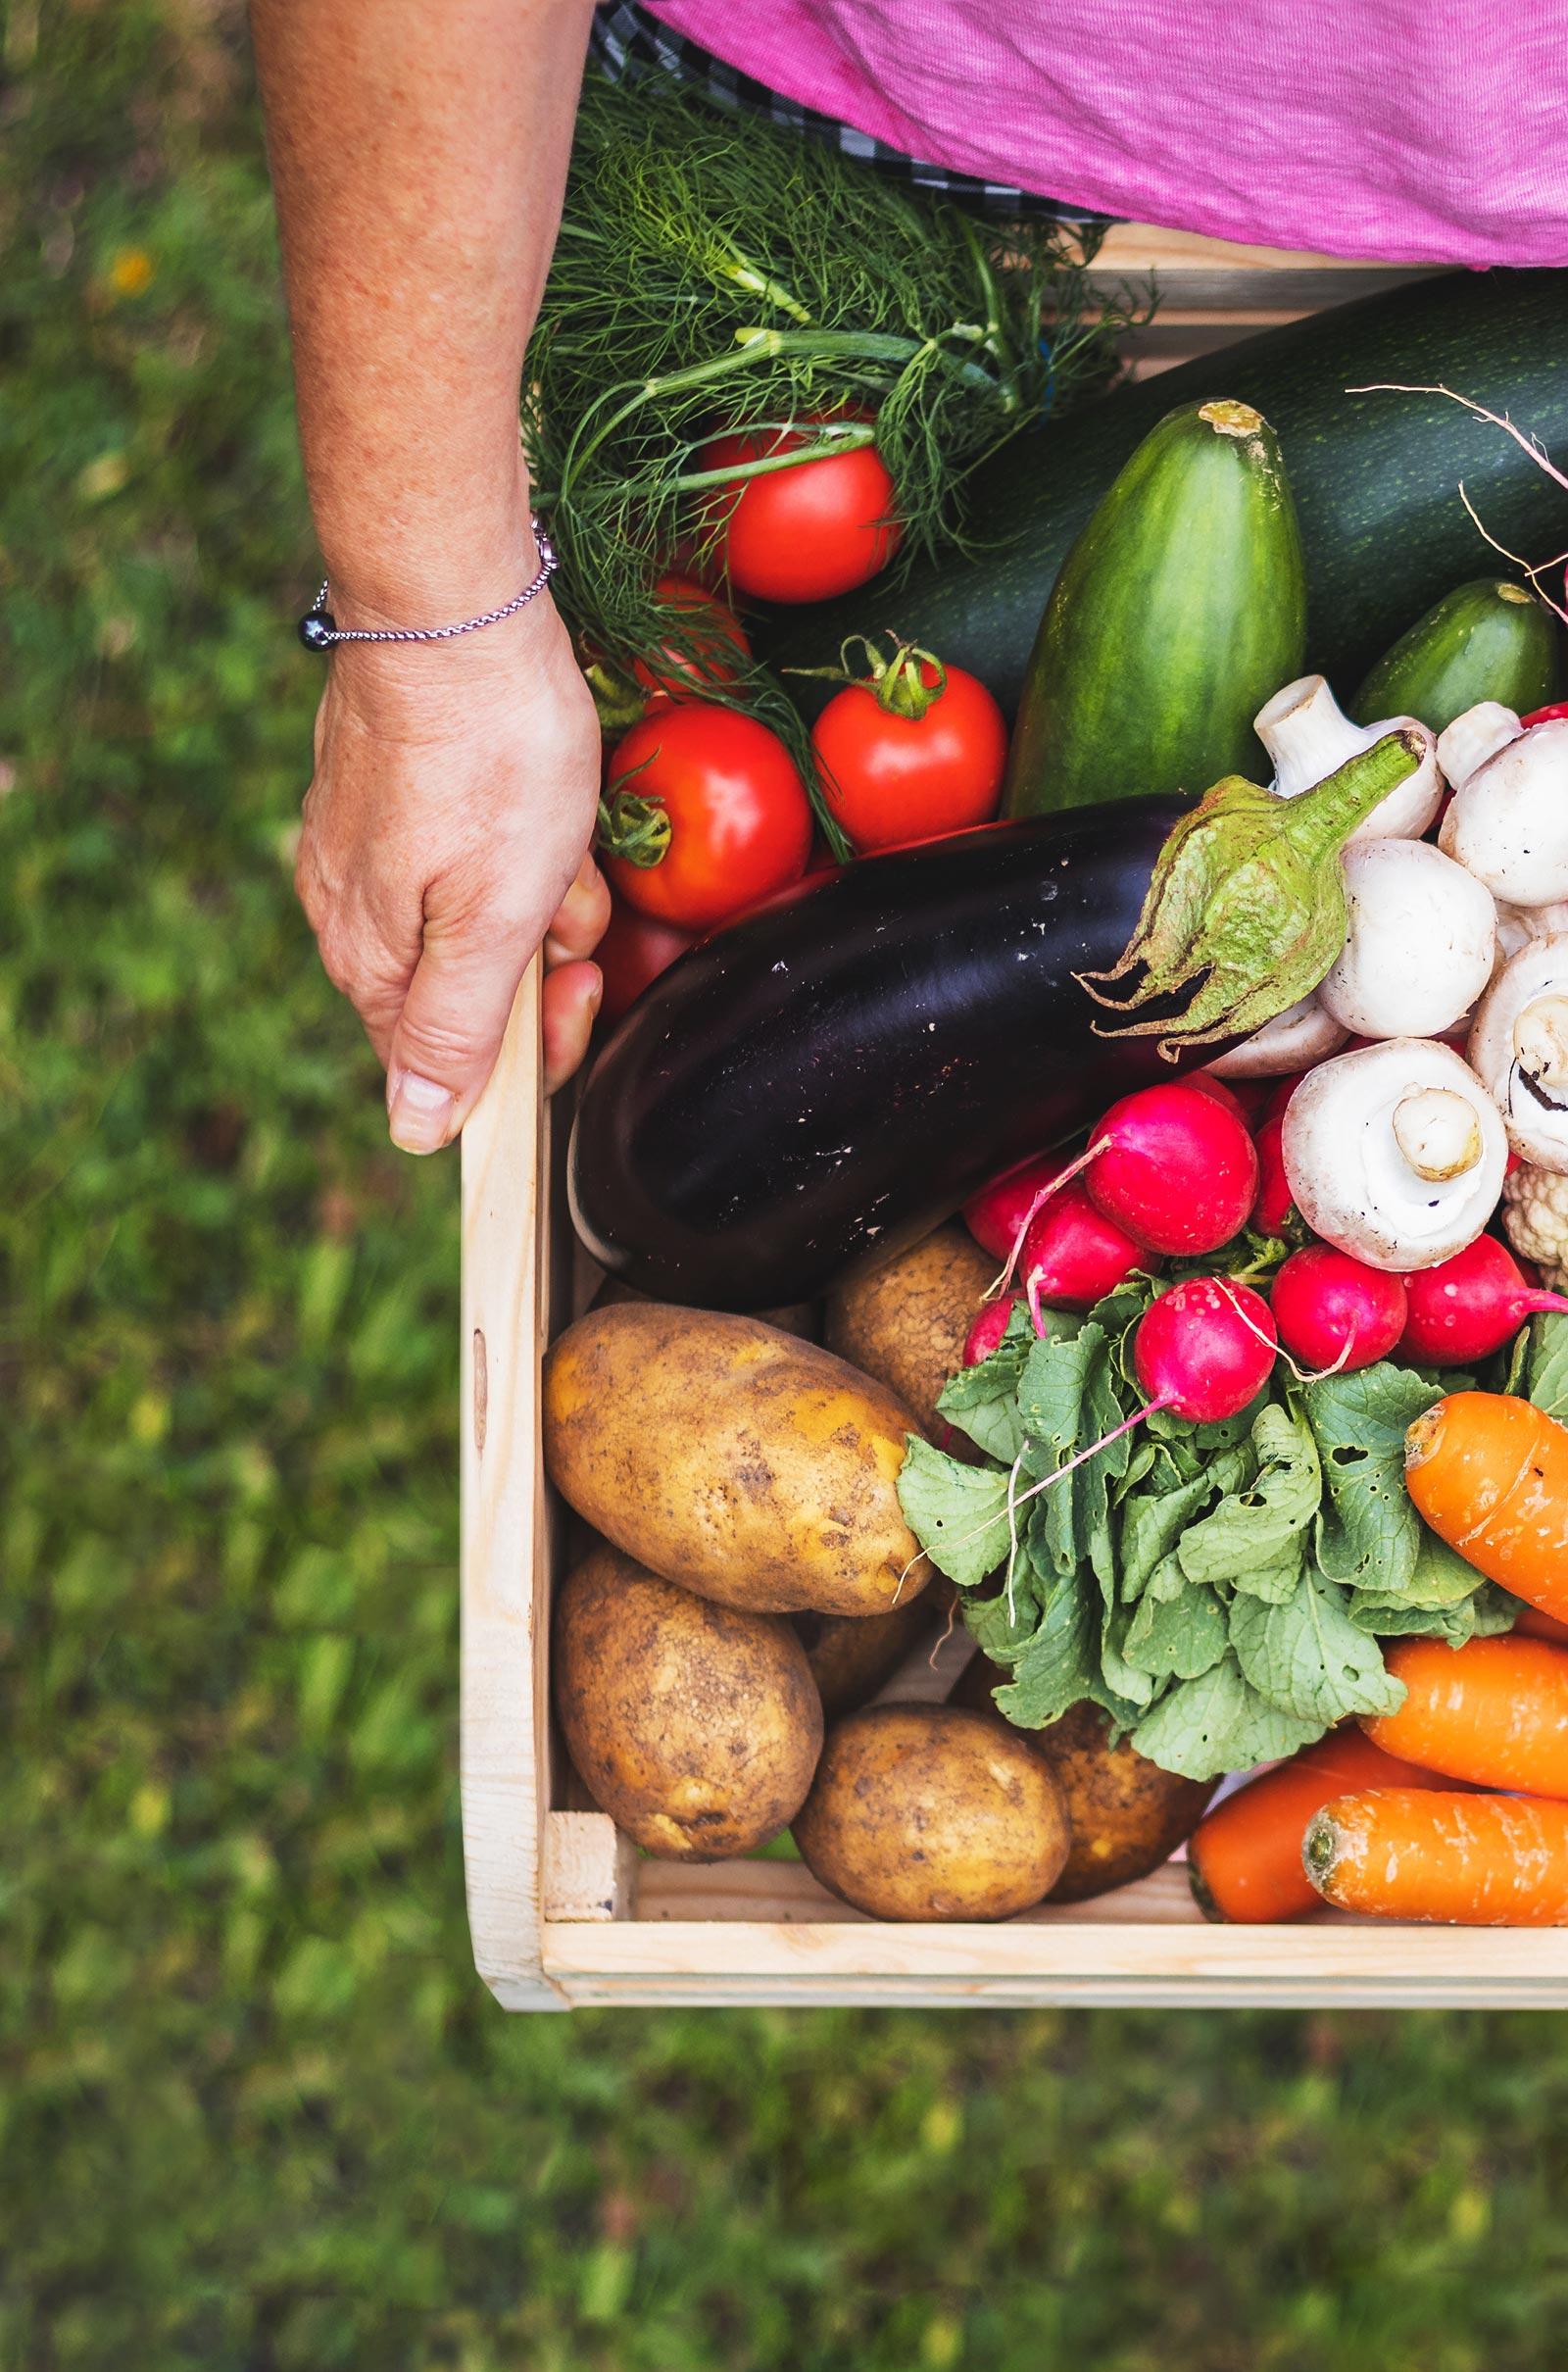 Frau hält Obsthaus Gemüsekiste aus Holz mit allerlei Gemüse